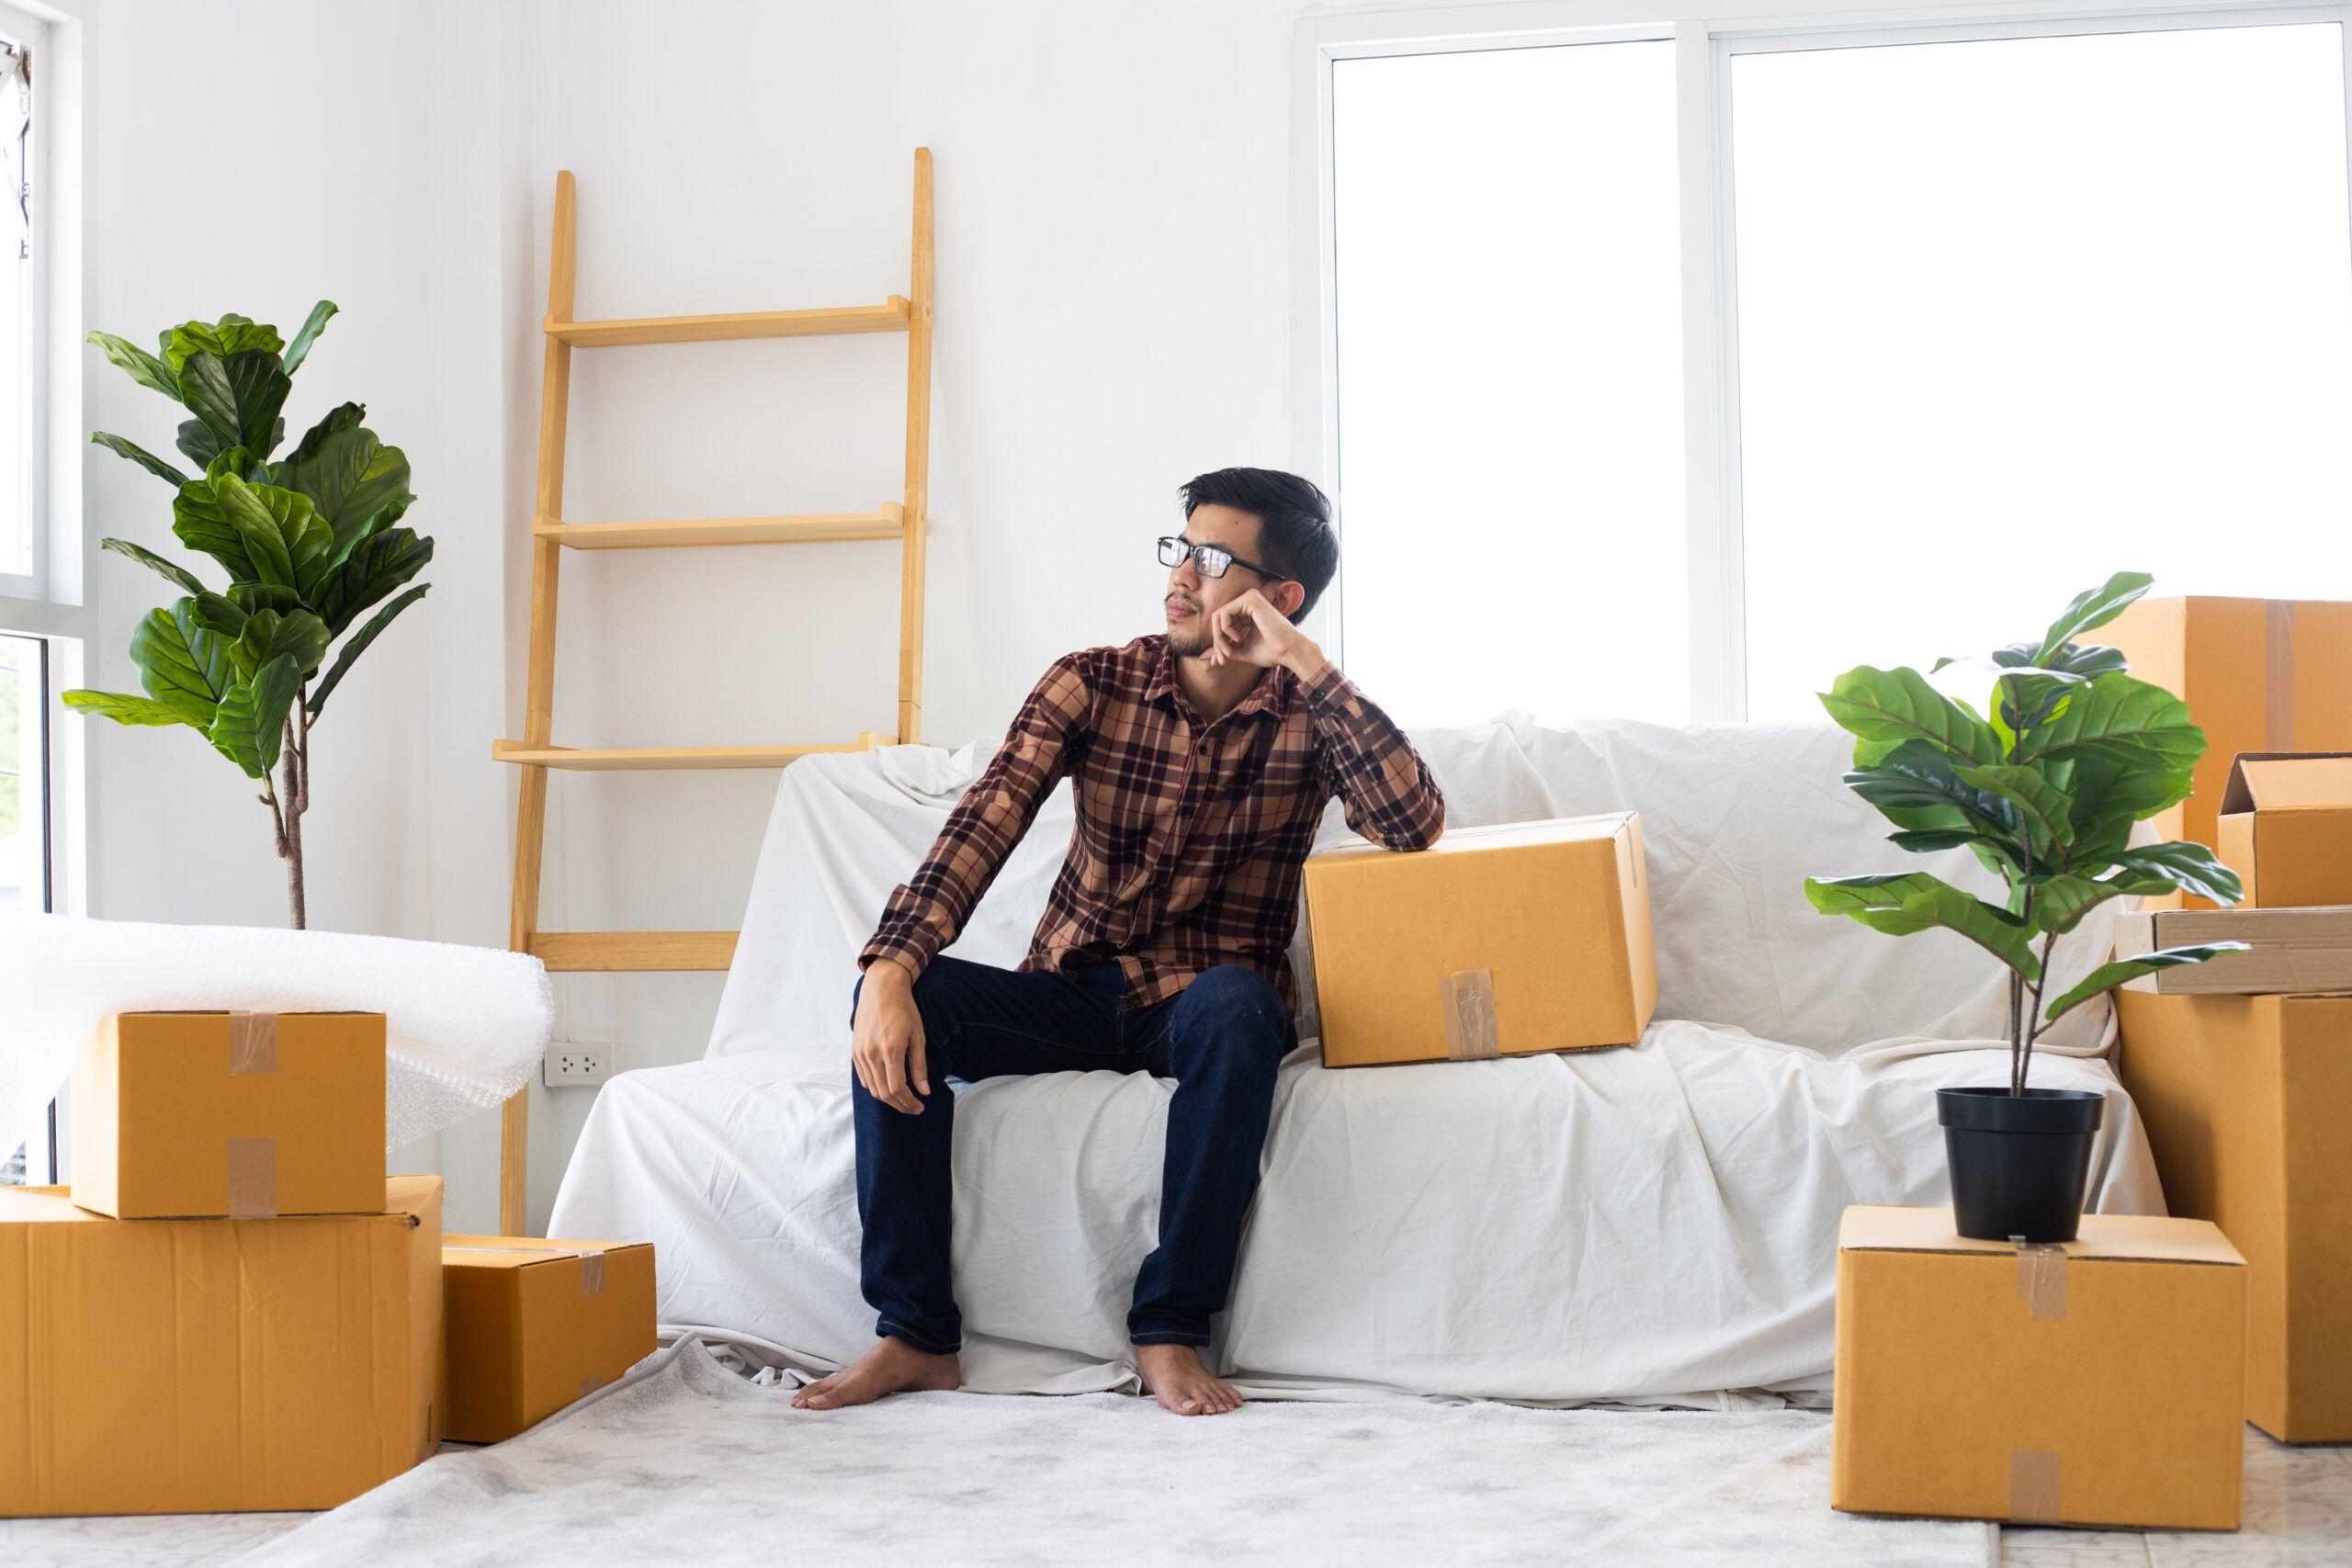 Should You Still Buy Life Insurance If You're Single? | WalletGenius